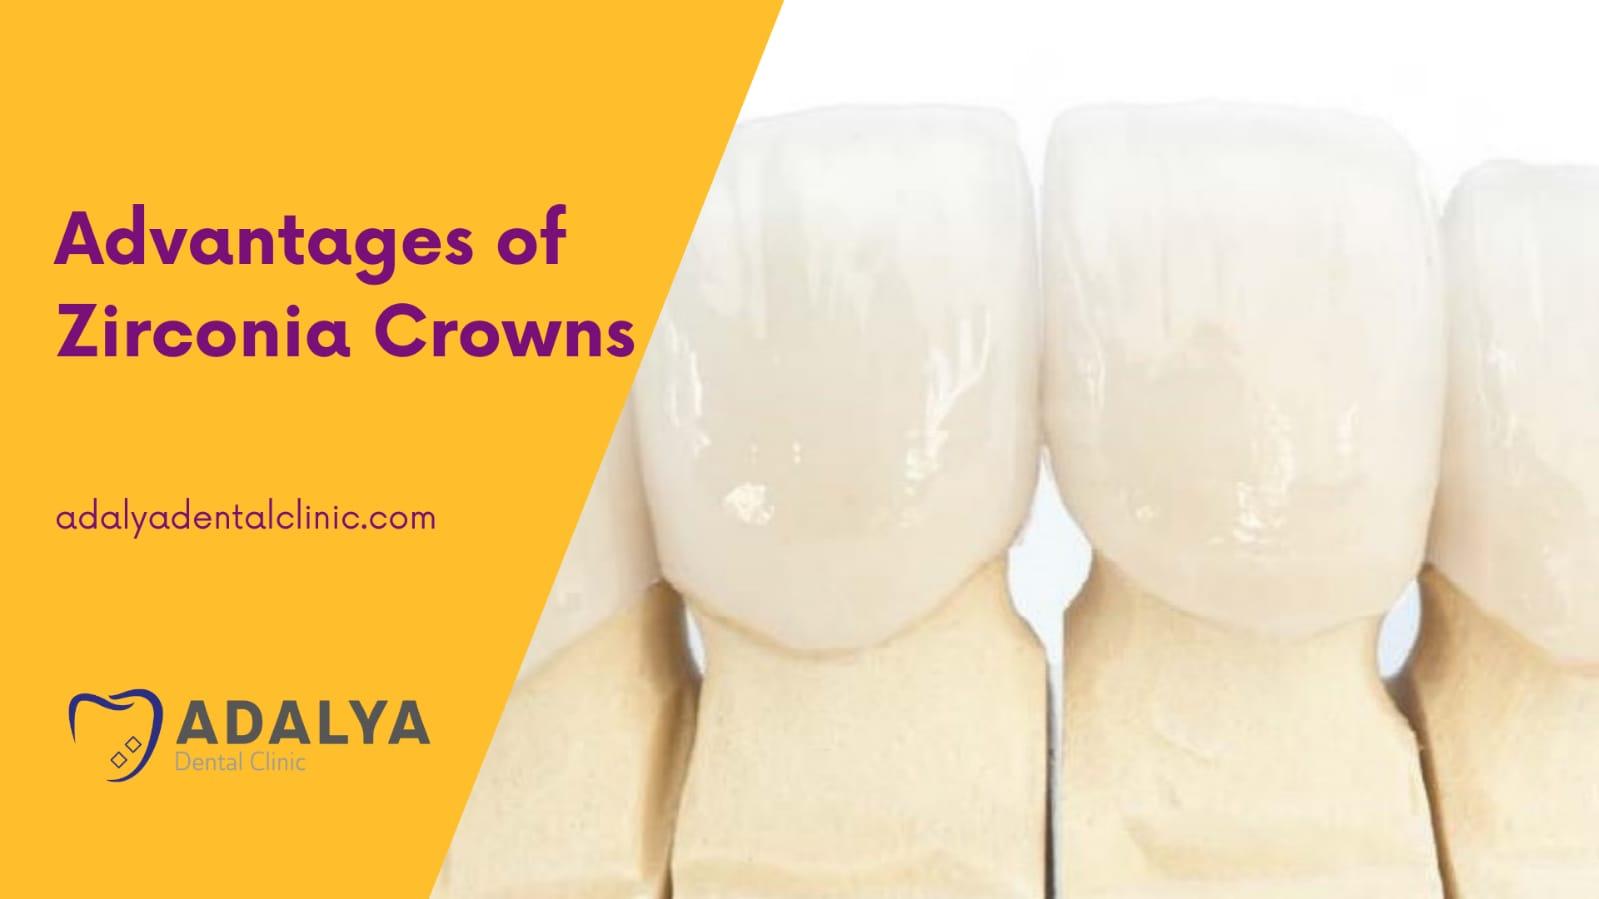 advantages of zirconia crowns